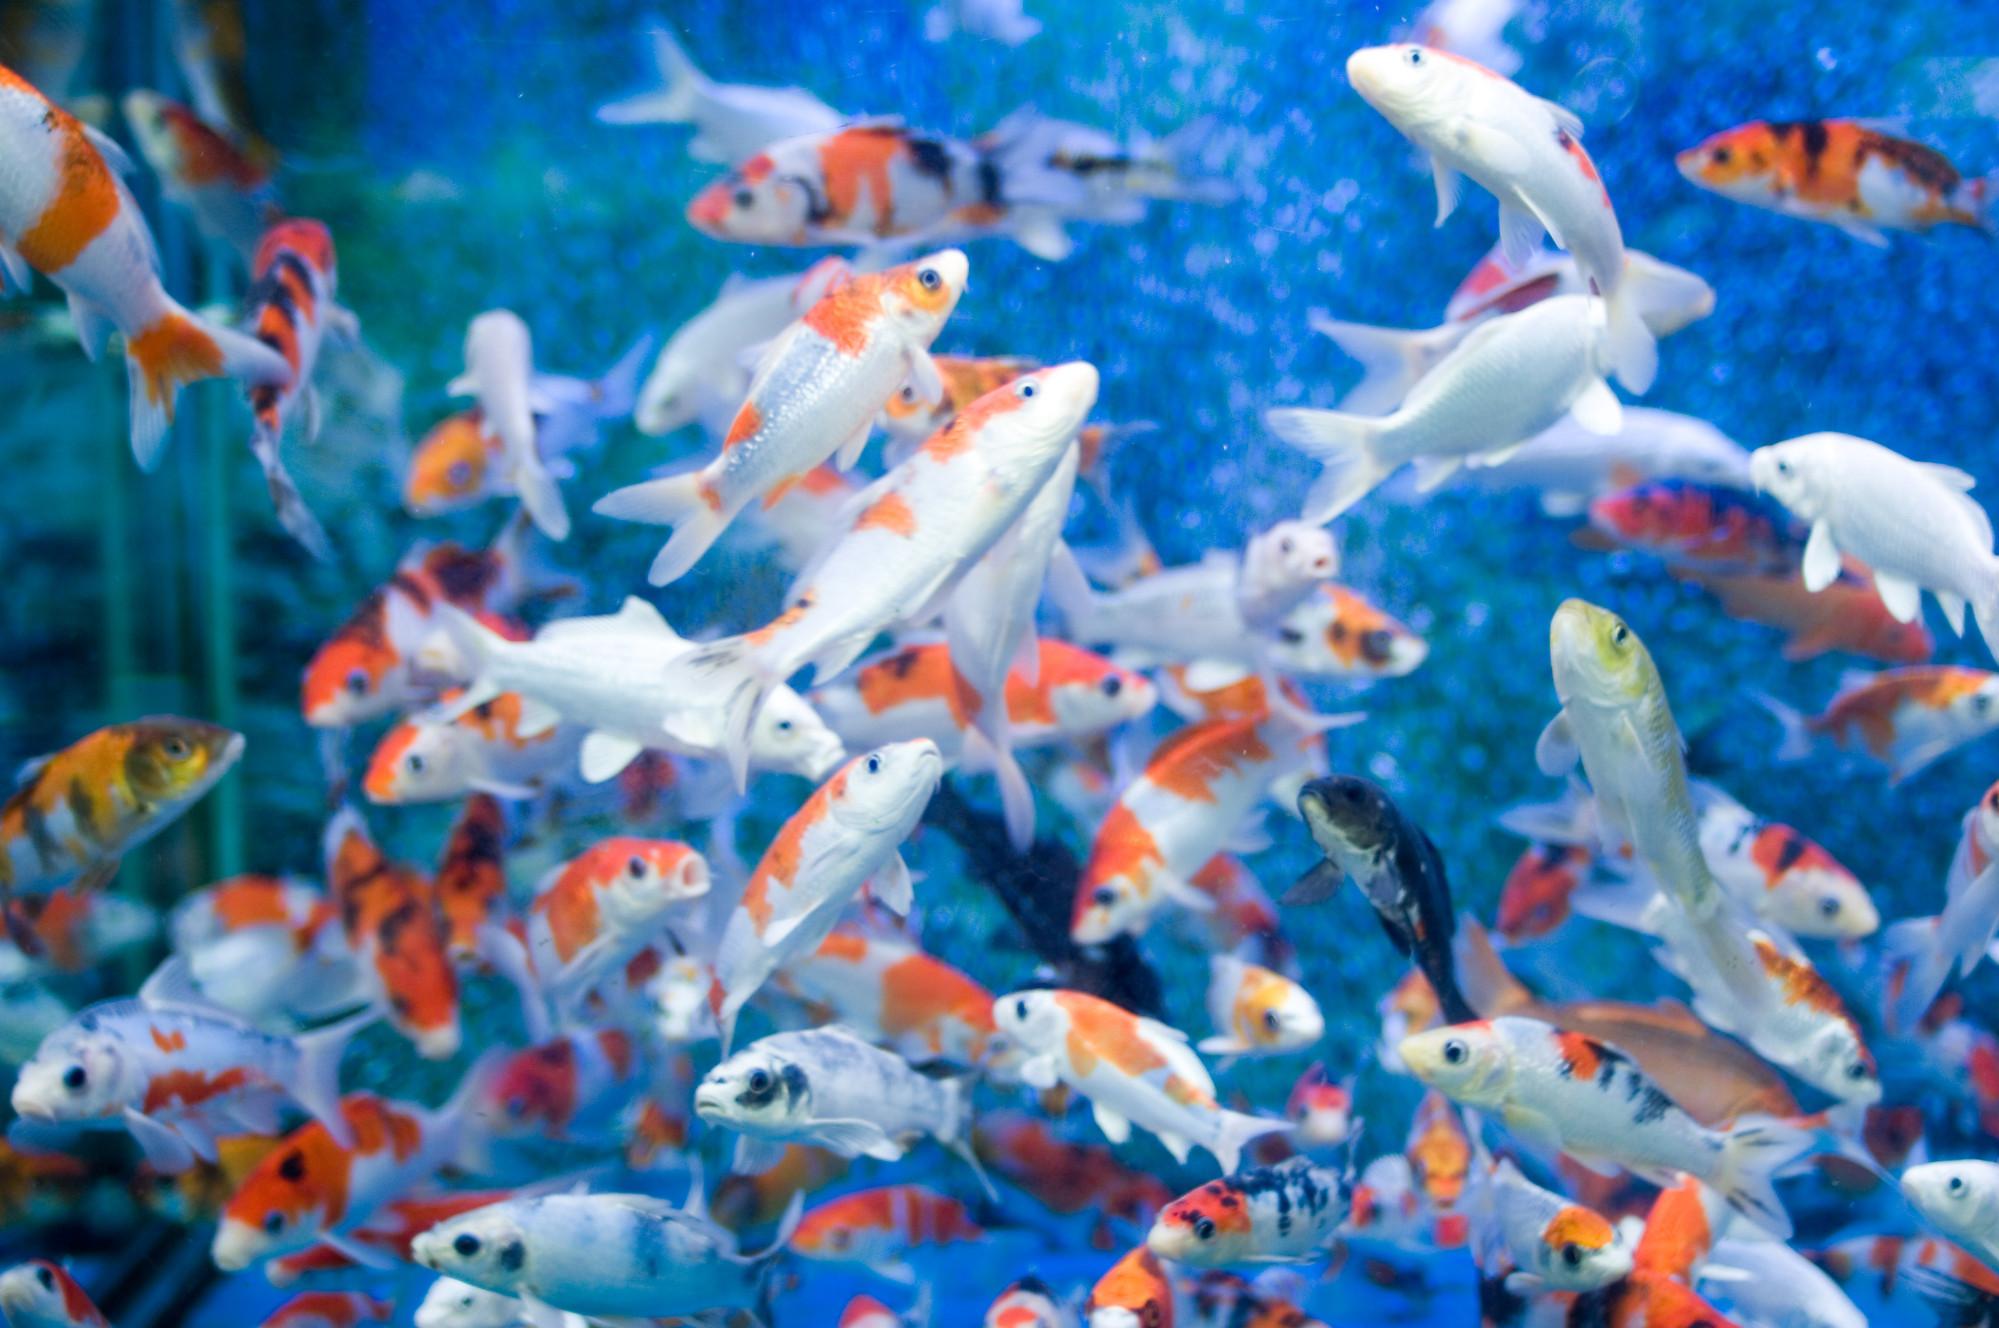 Desktop Wallpaper Animated Aquarium Greenmamahk Store Magecloud Net